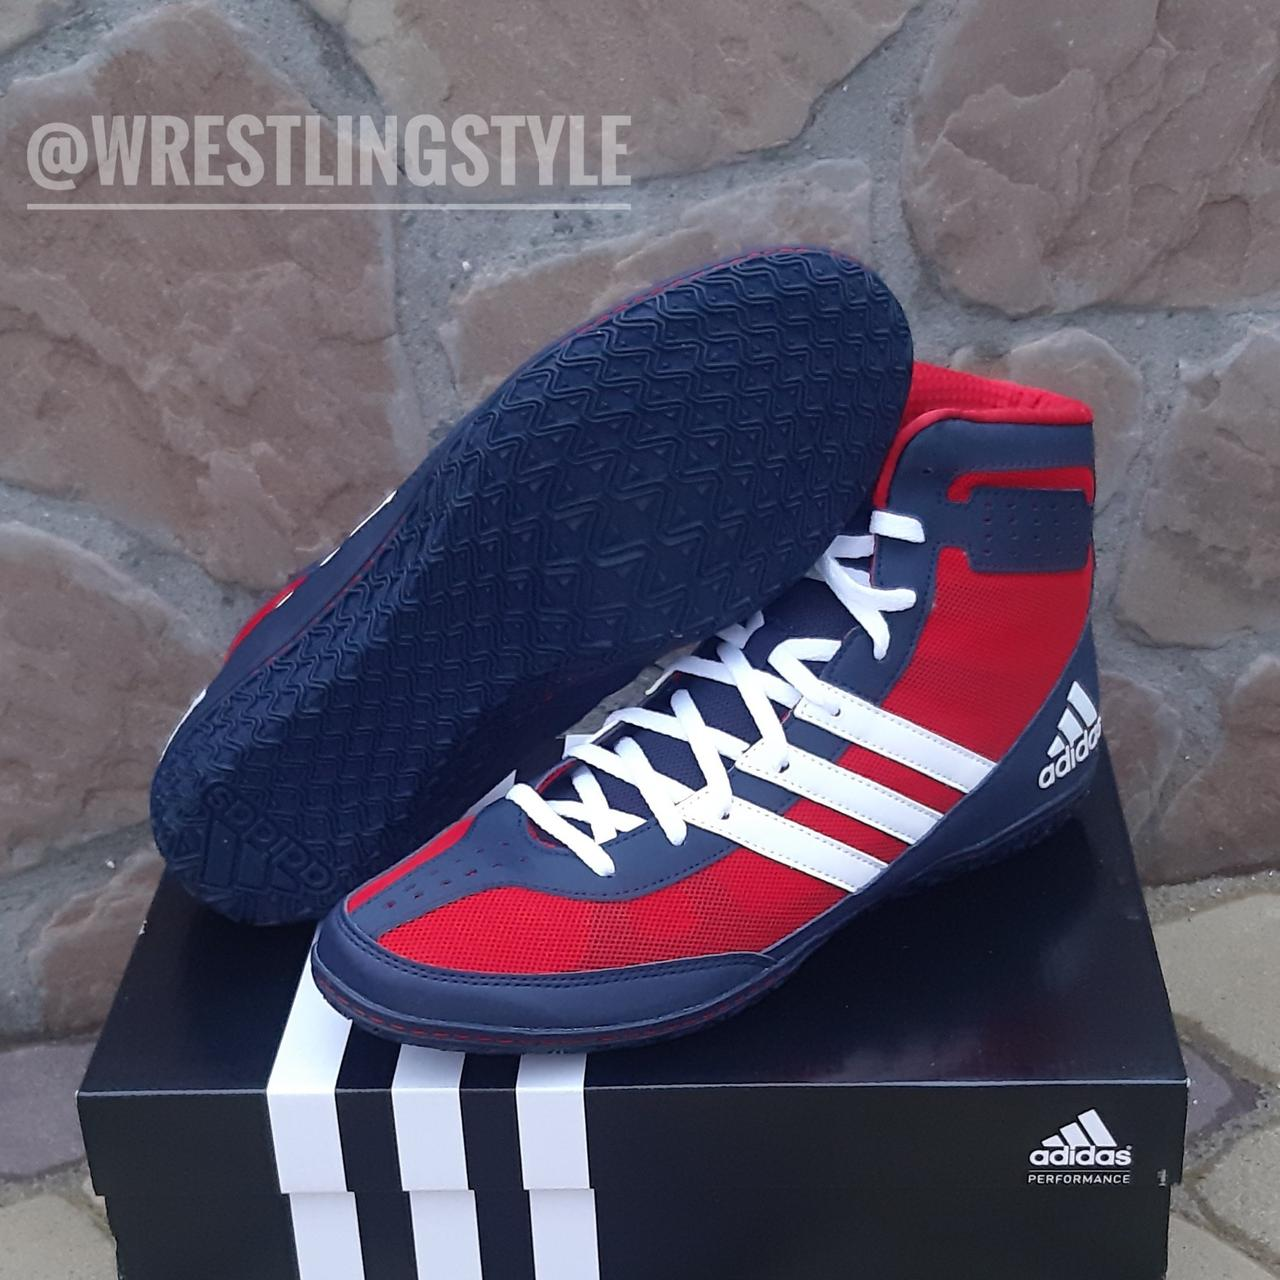 Борцовки, боксерки Adidas Mat Wizard 3. Обувь для борьбы, бокса.